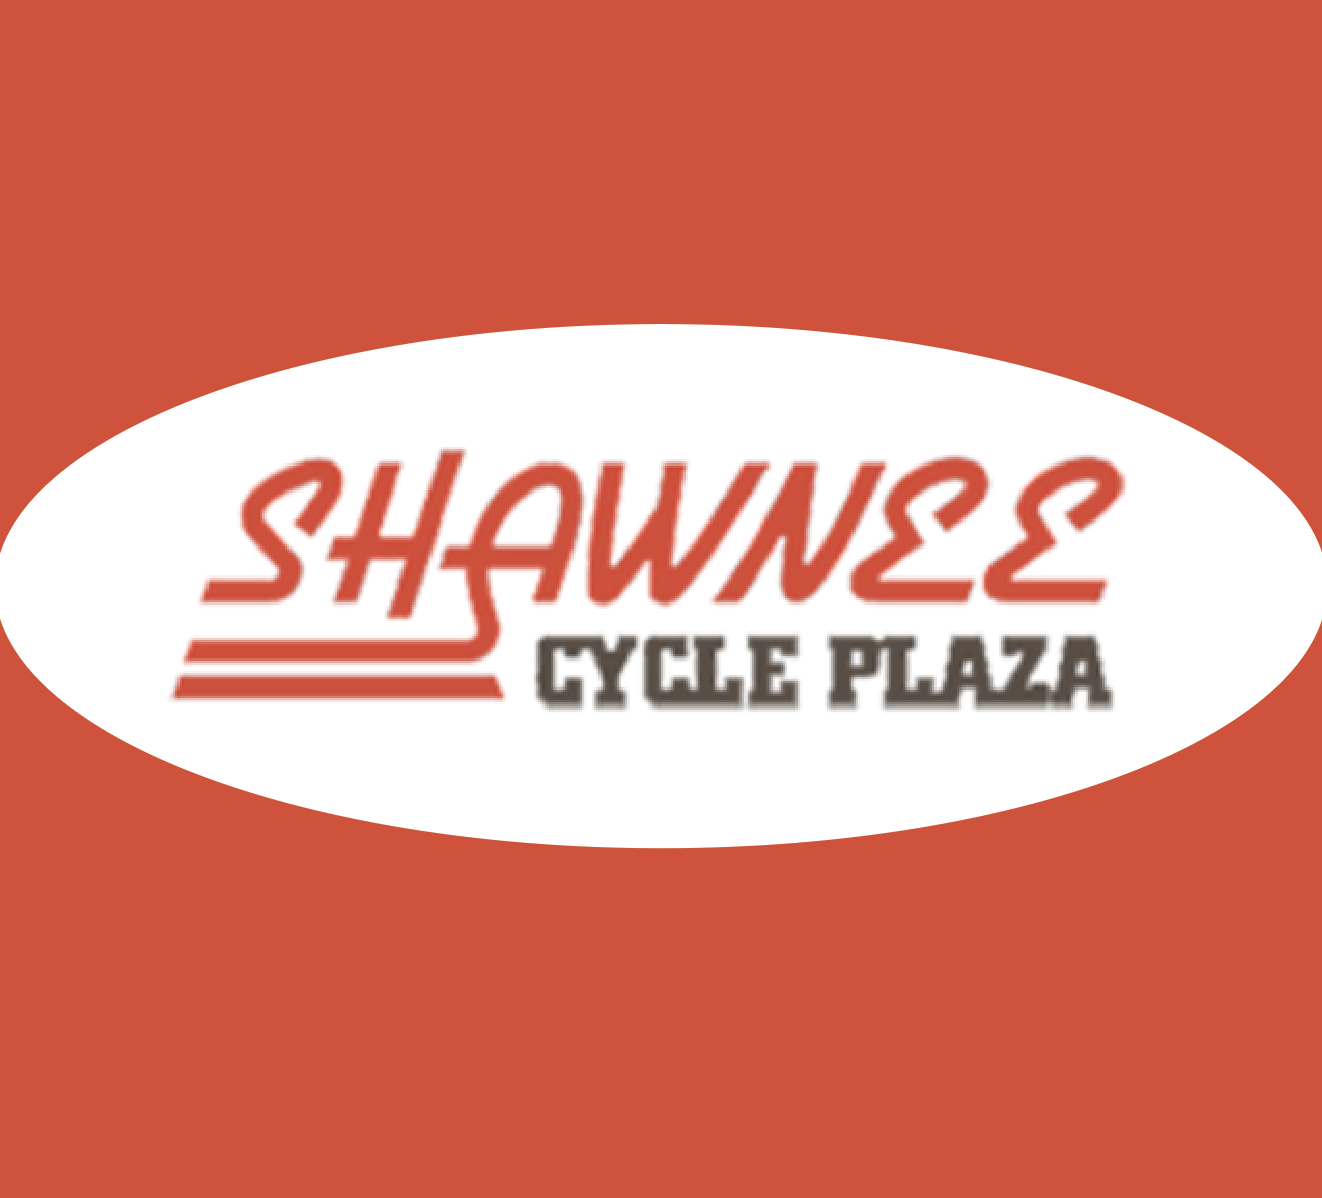 Shawnee Cycle Plaza